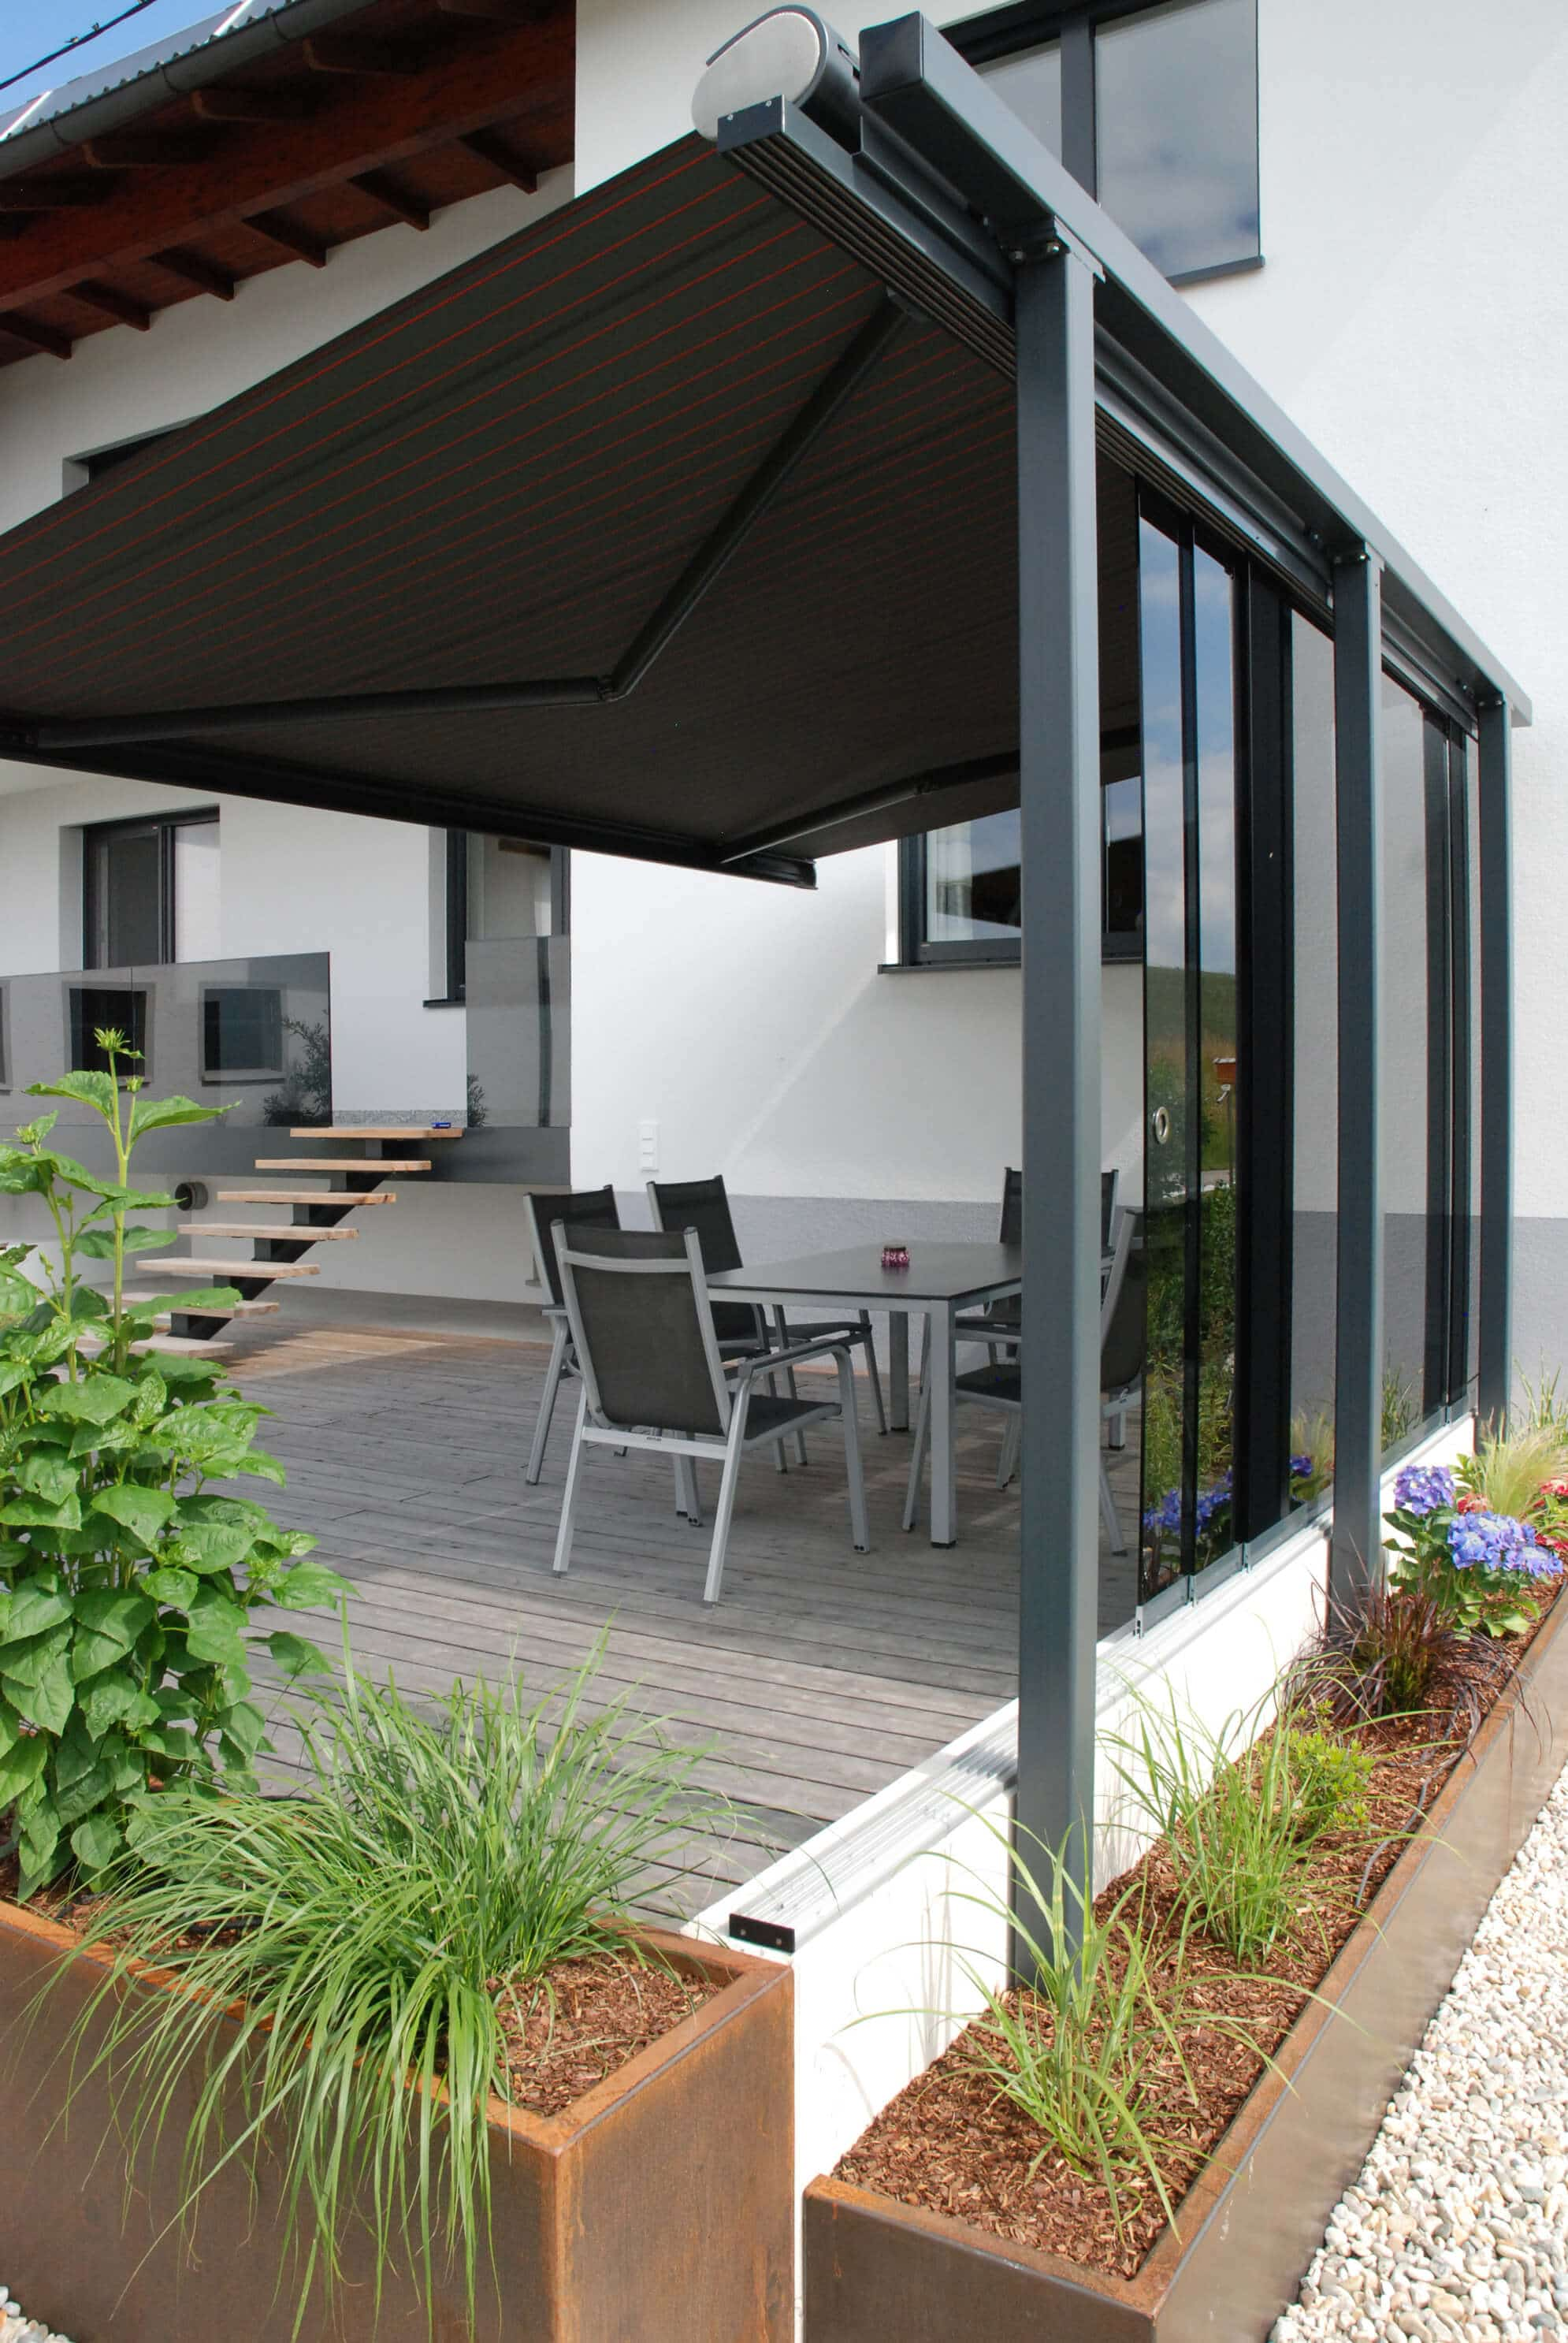 schiebeverglasung in holzkonstruktion montiert fenster schmidinger. Black Bedroom Furniture Sets. Home Design Ideas